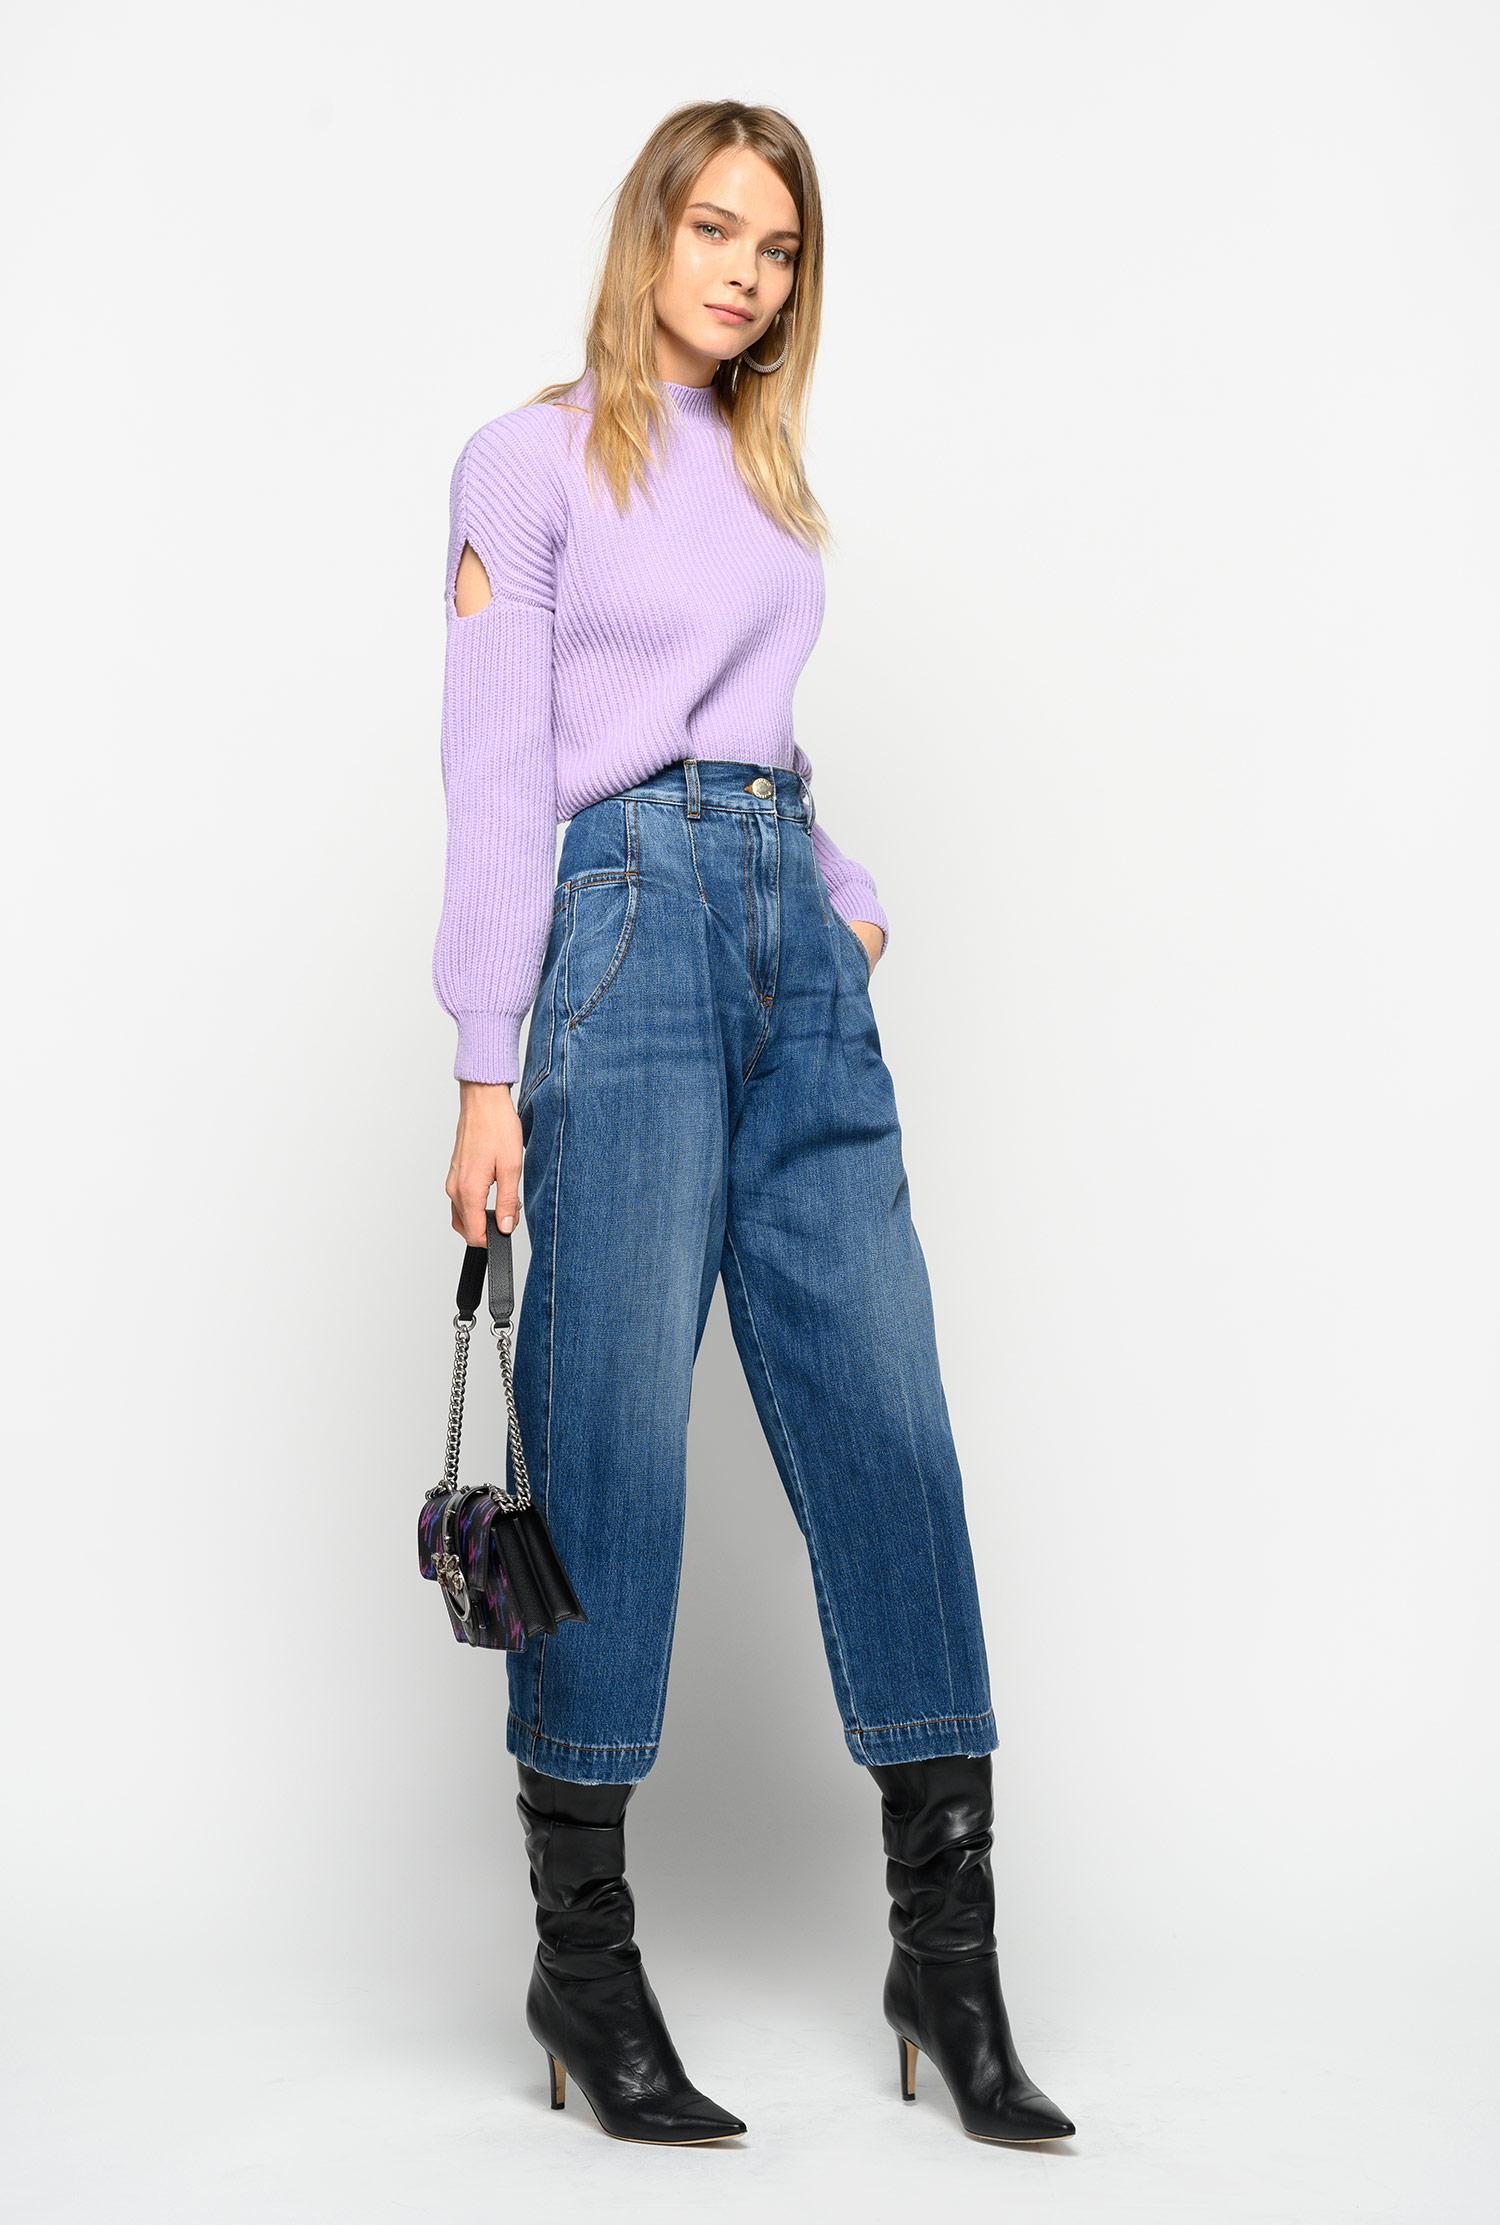 culotte style vintage denim